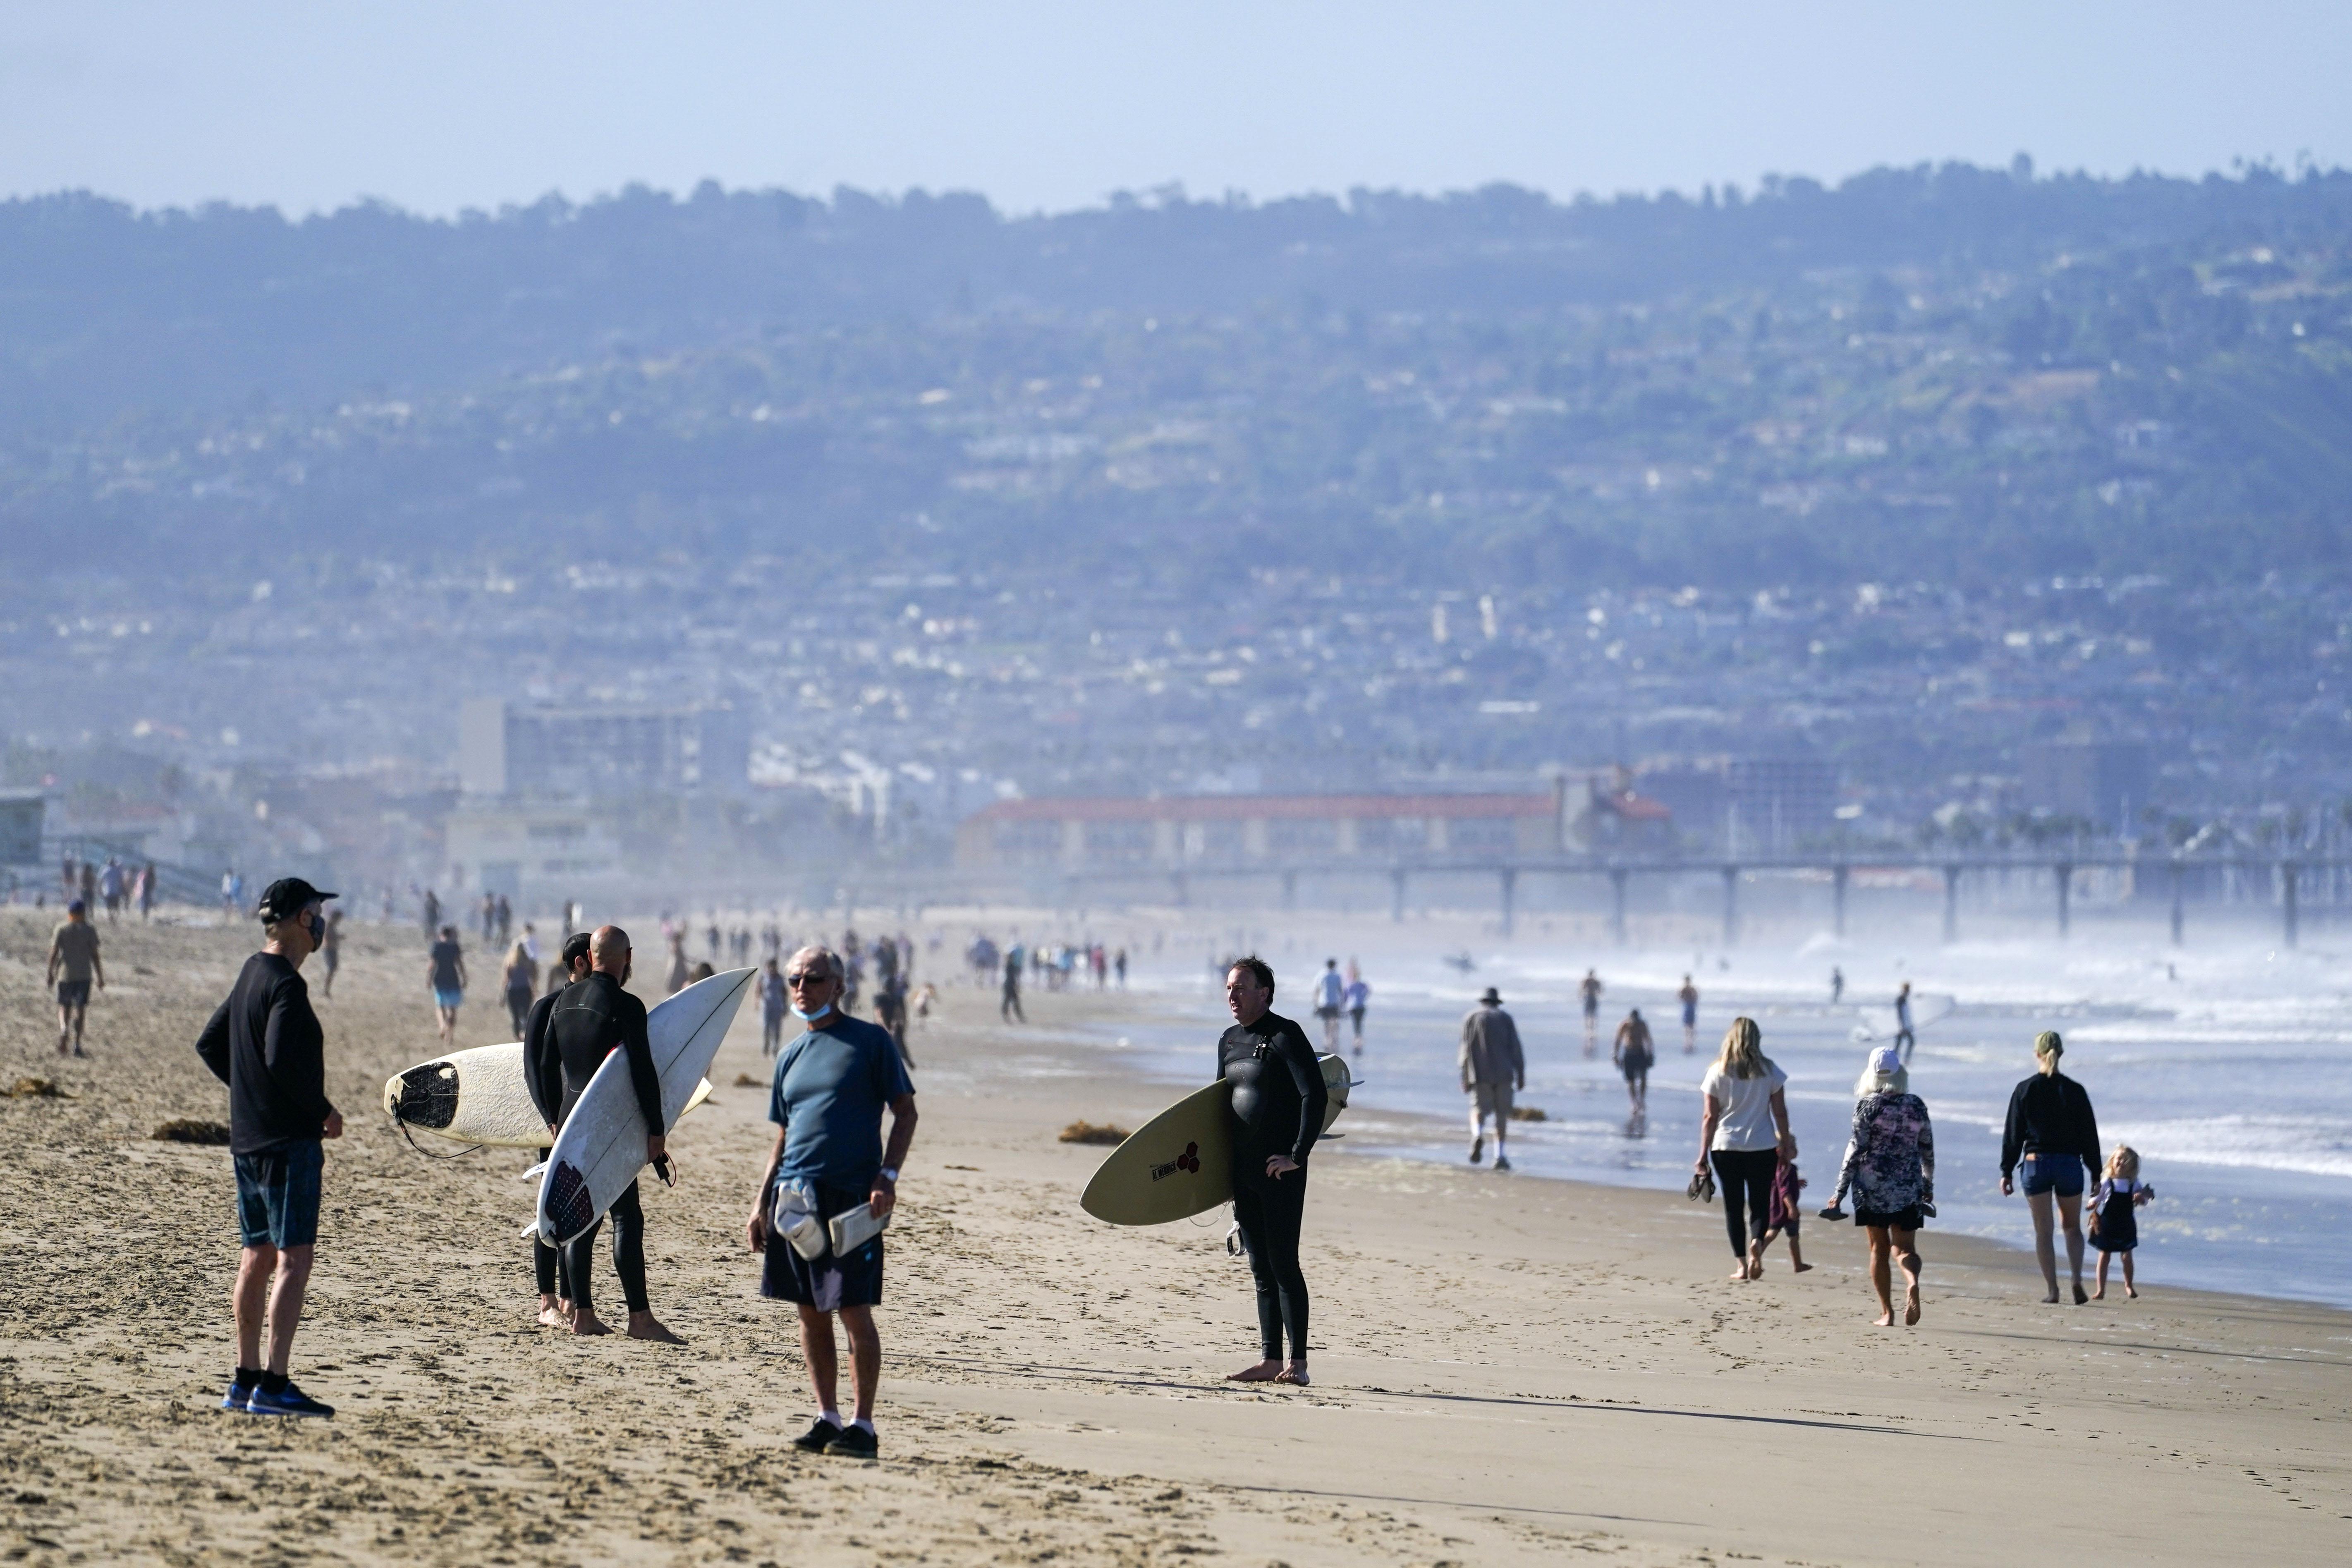 People walk on the sand in Manhattan Beach, California, on May 13.